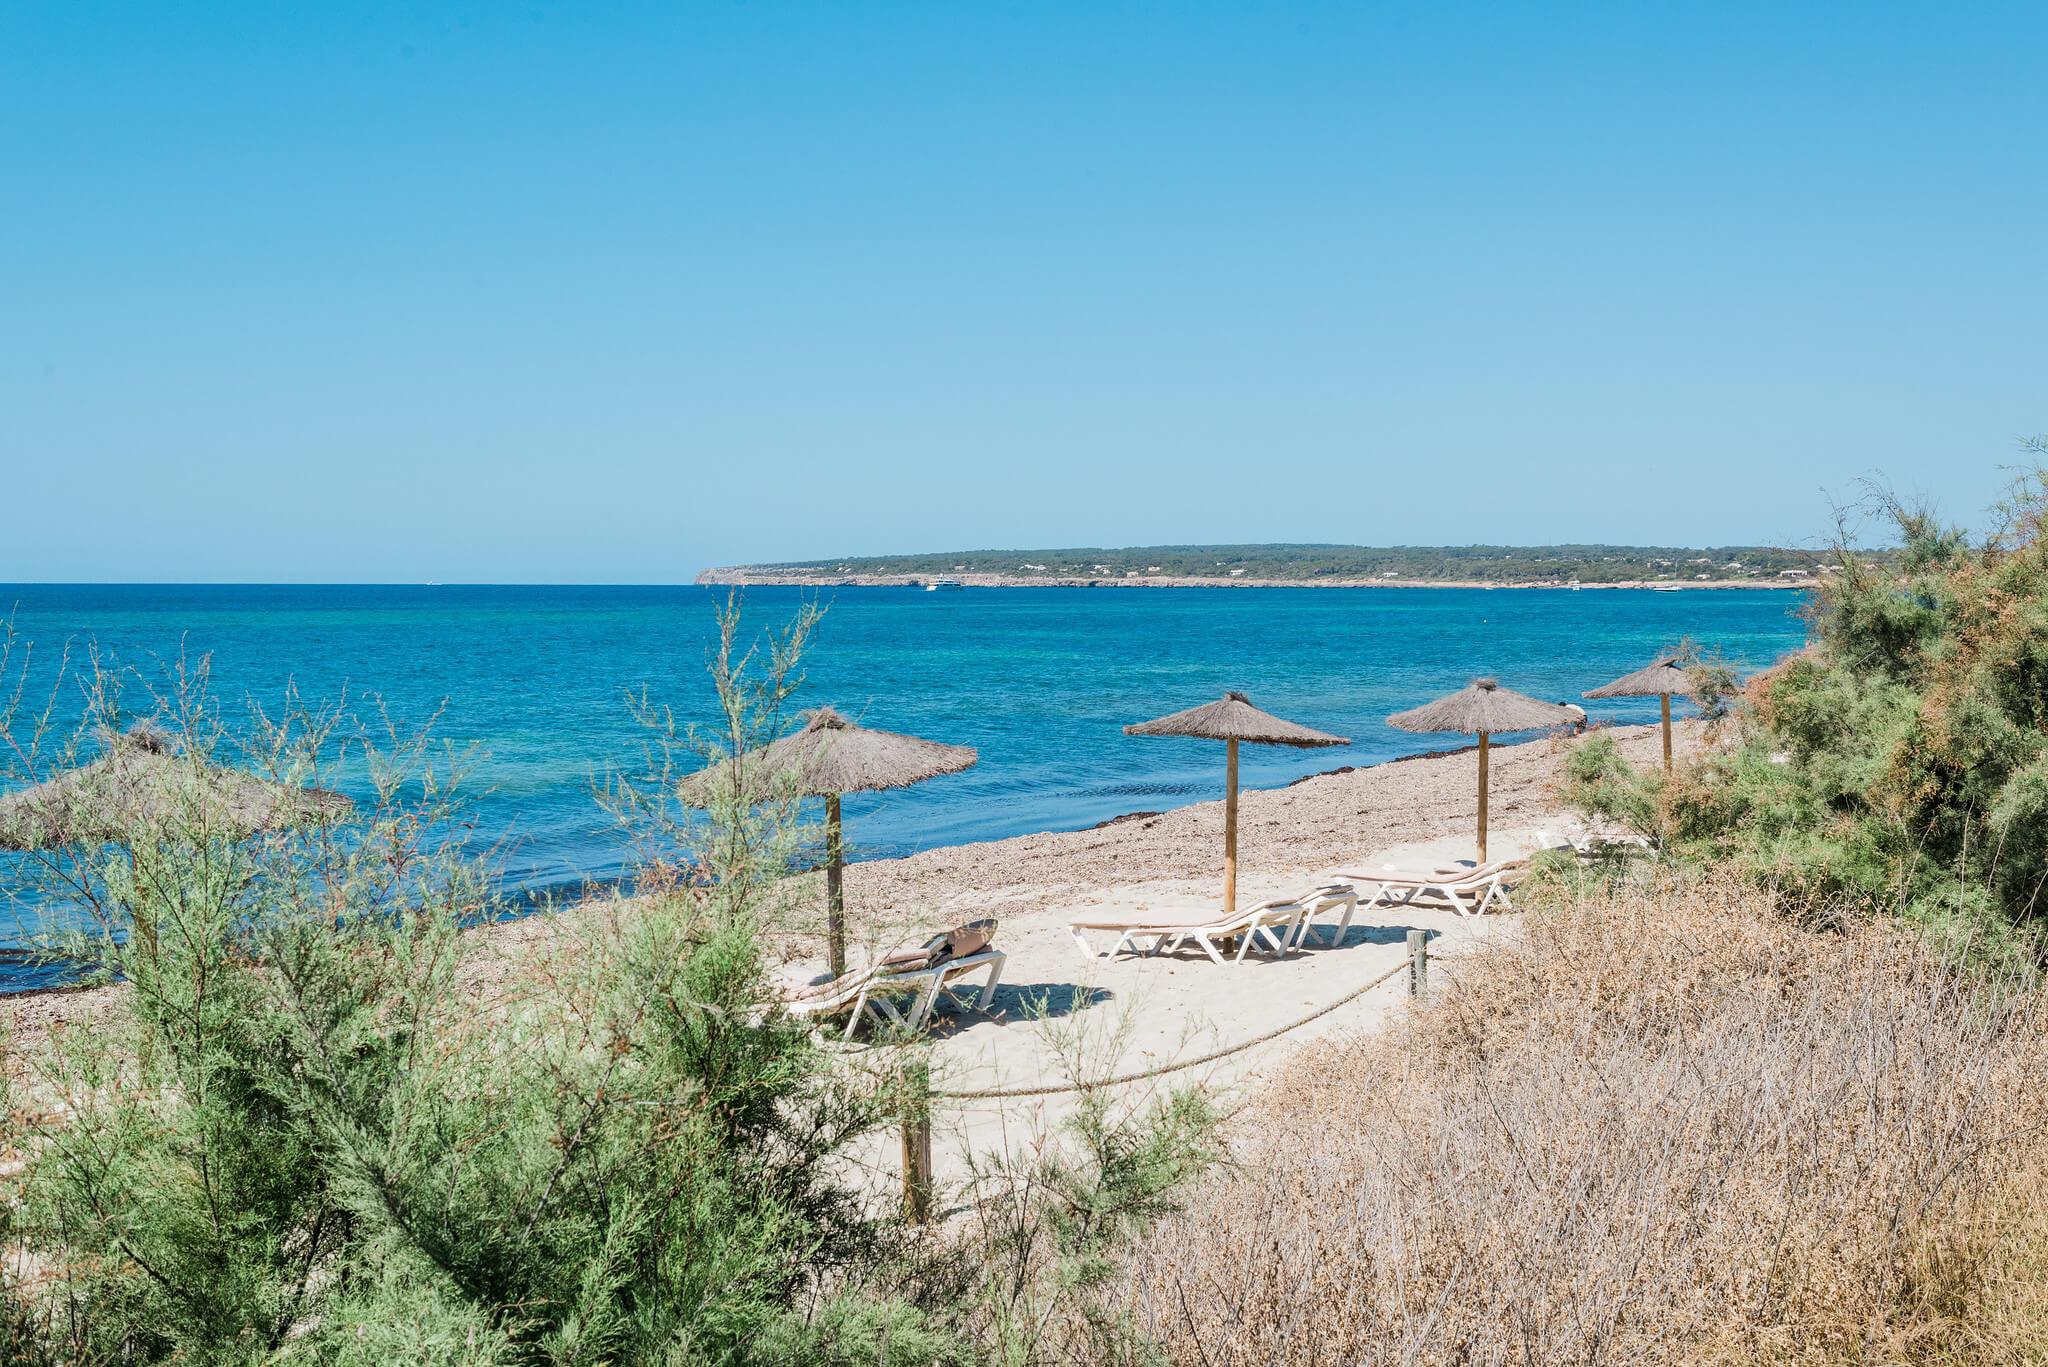 https://www.white-ibiza.com/wp-content/uploads/2020/03/formentera-beaches-migjorn-2020-06.jpg